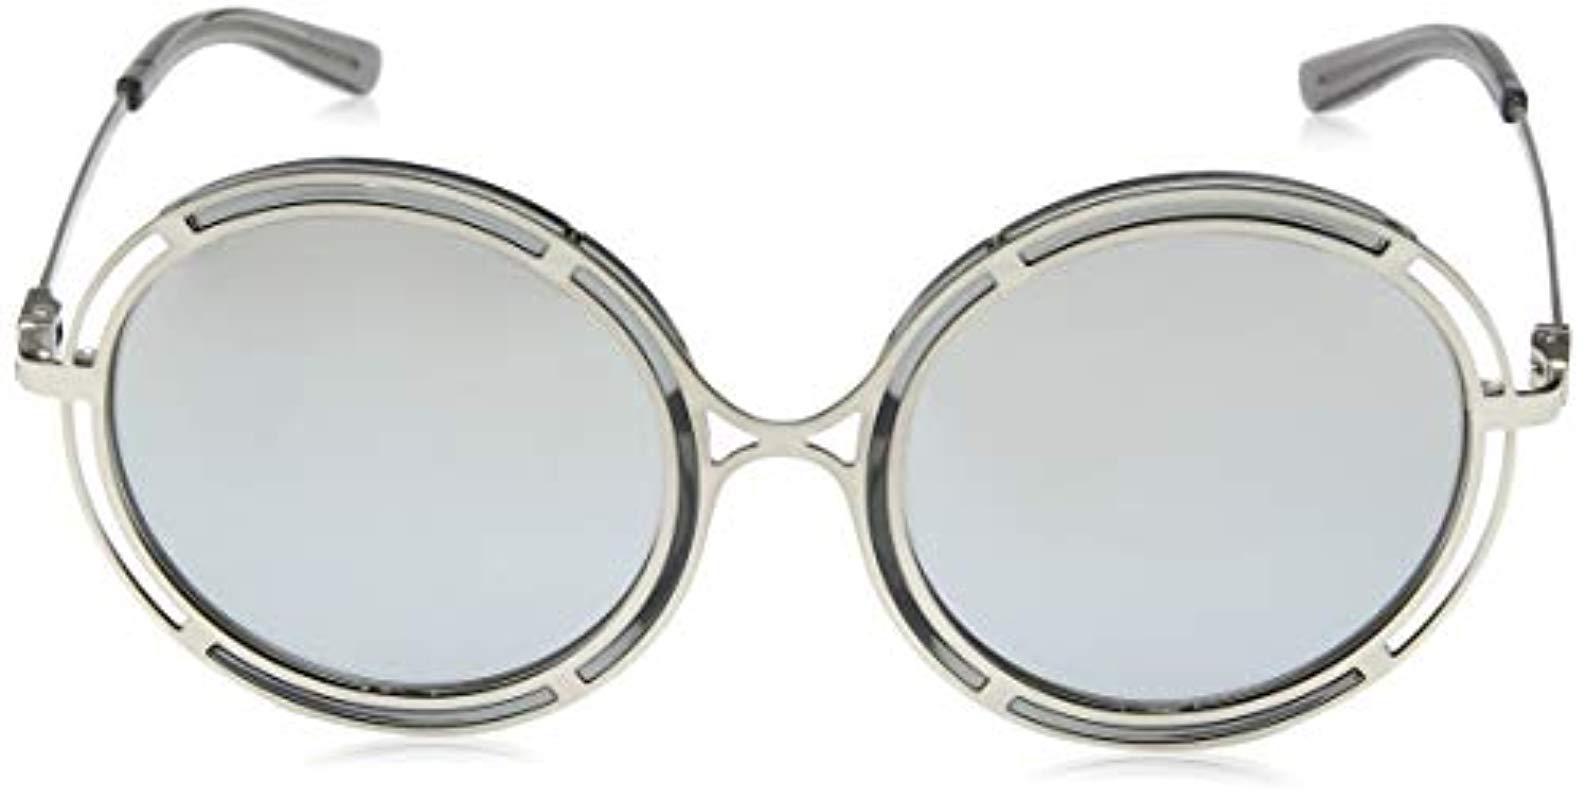 75dc9fecd352 Ralph By Ralph Lauren - Metallic Metal Woman Sunglass Non-polarized Iridium  Round, Sanded. View fullscreen